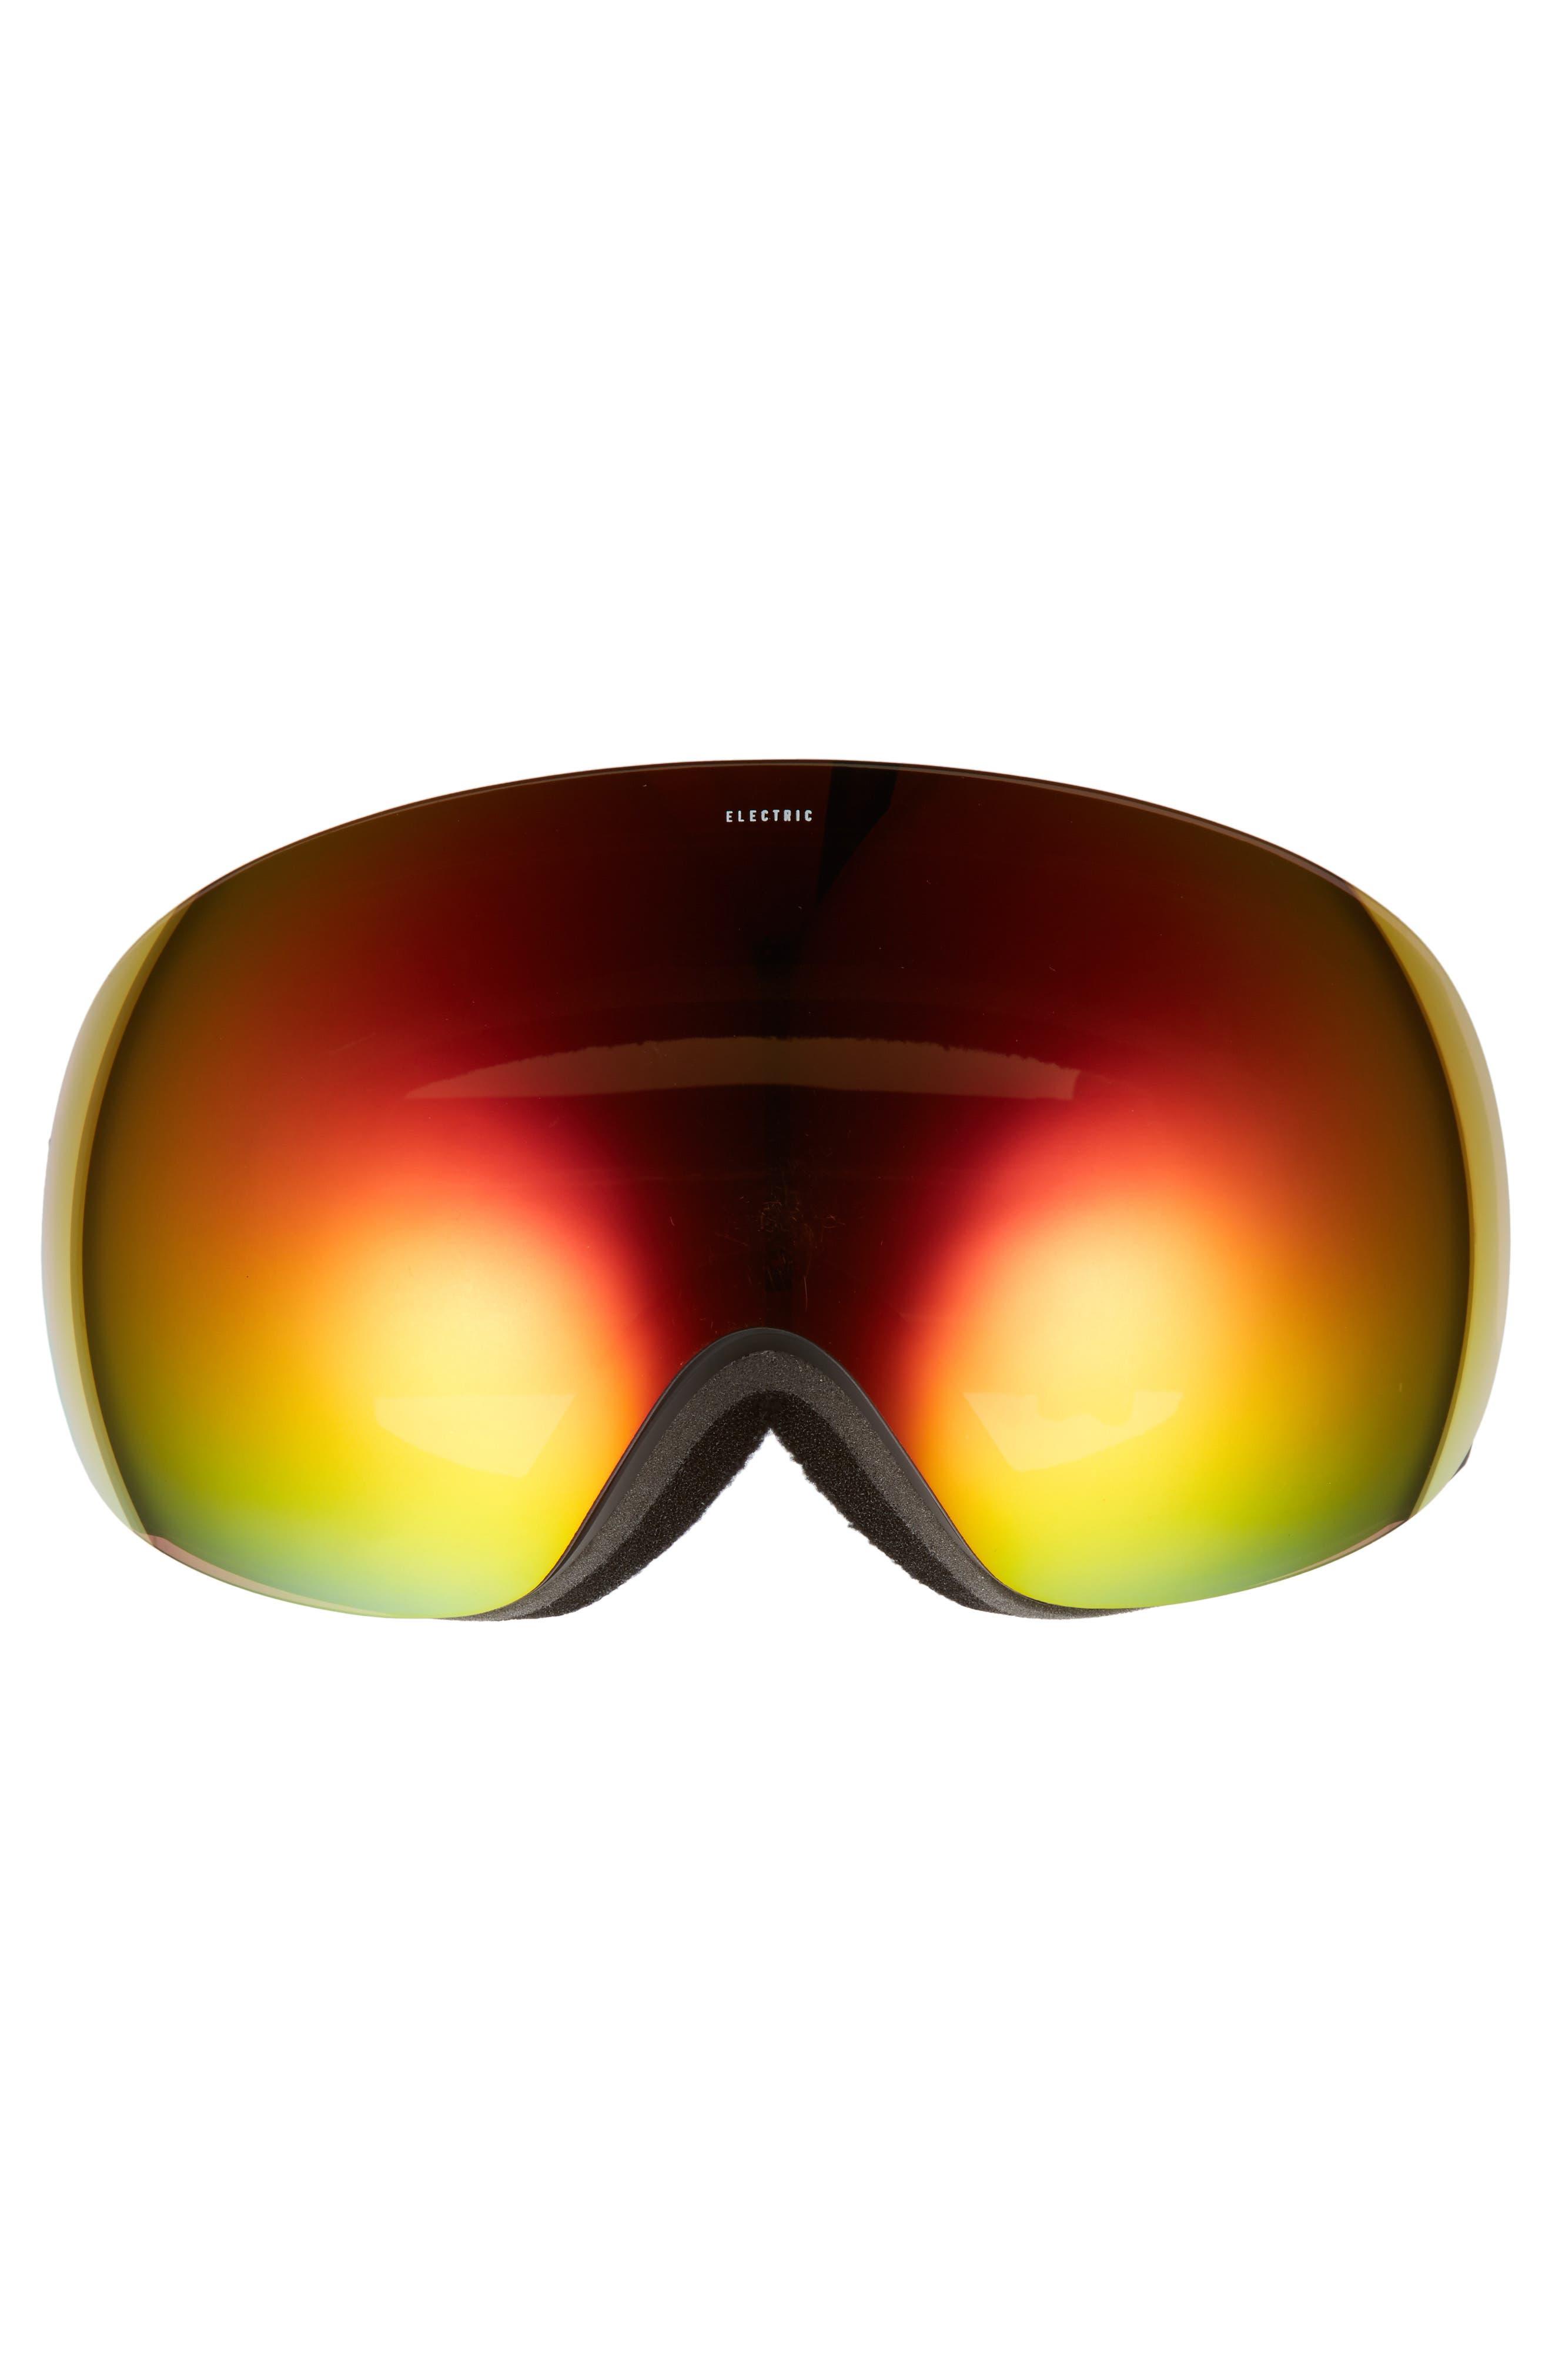 EG3 Snow Goggles,                             Alternate thumbnail 3, color,                             001